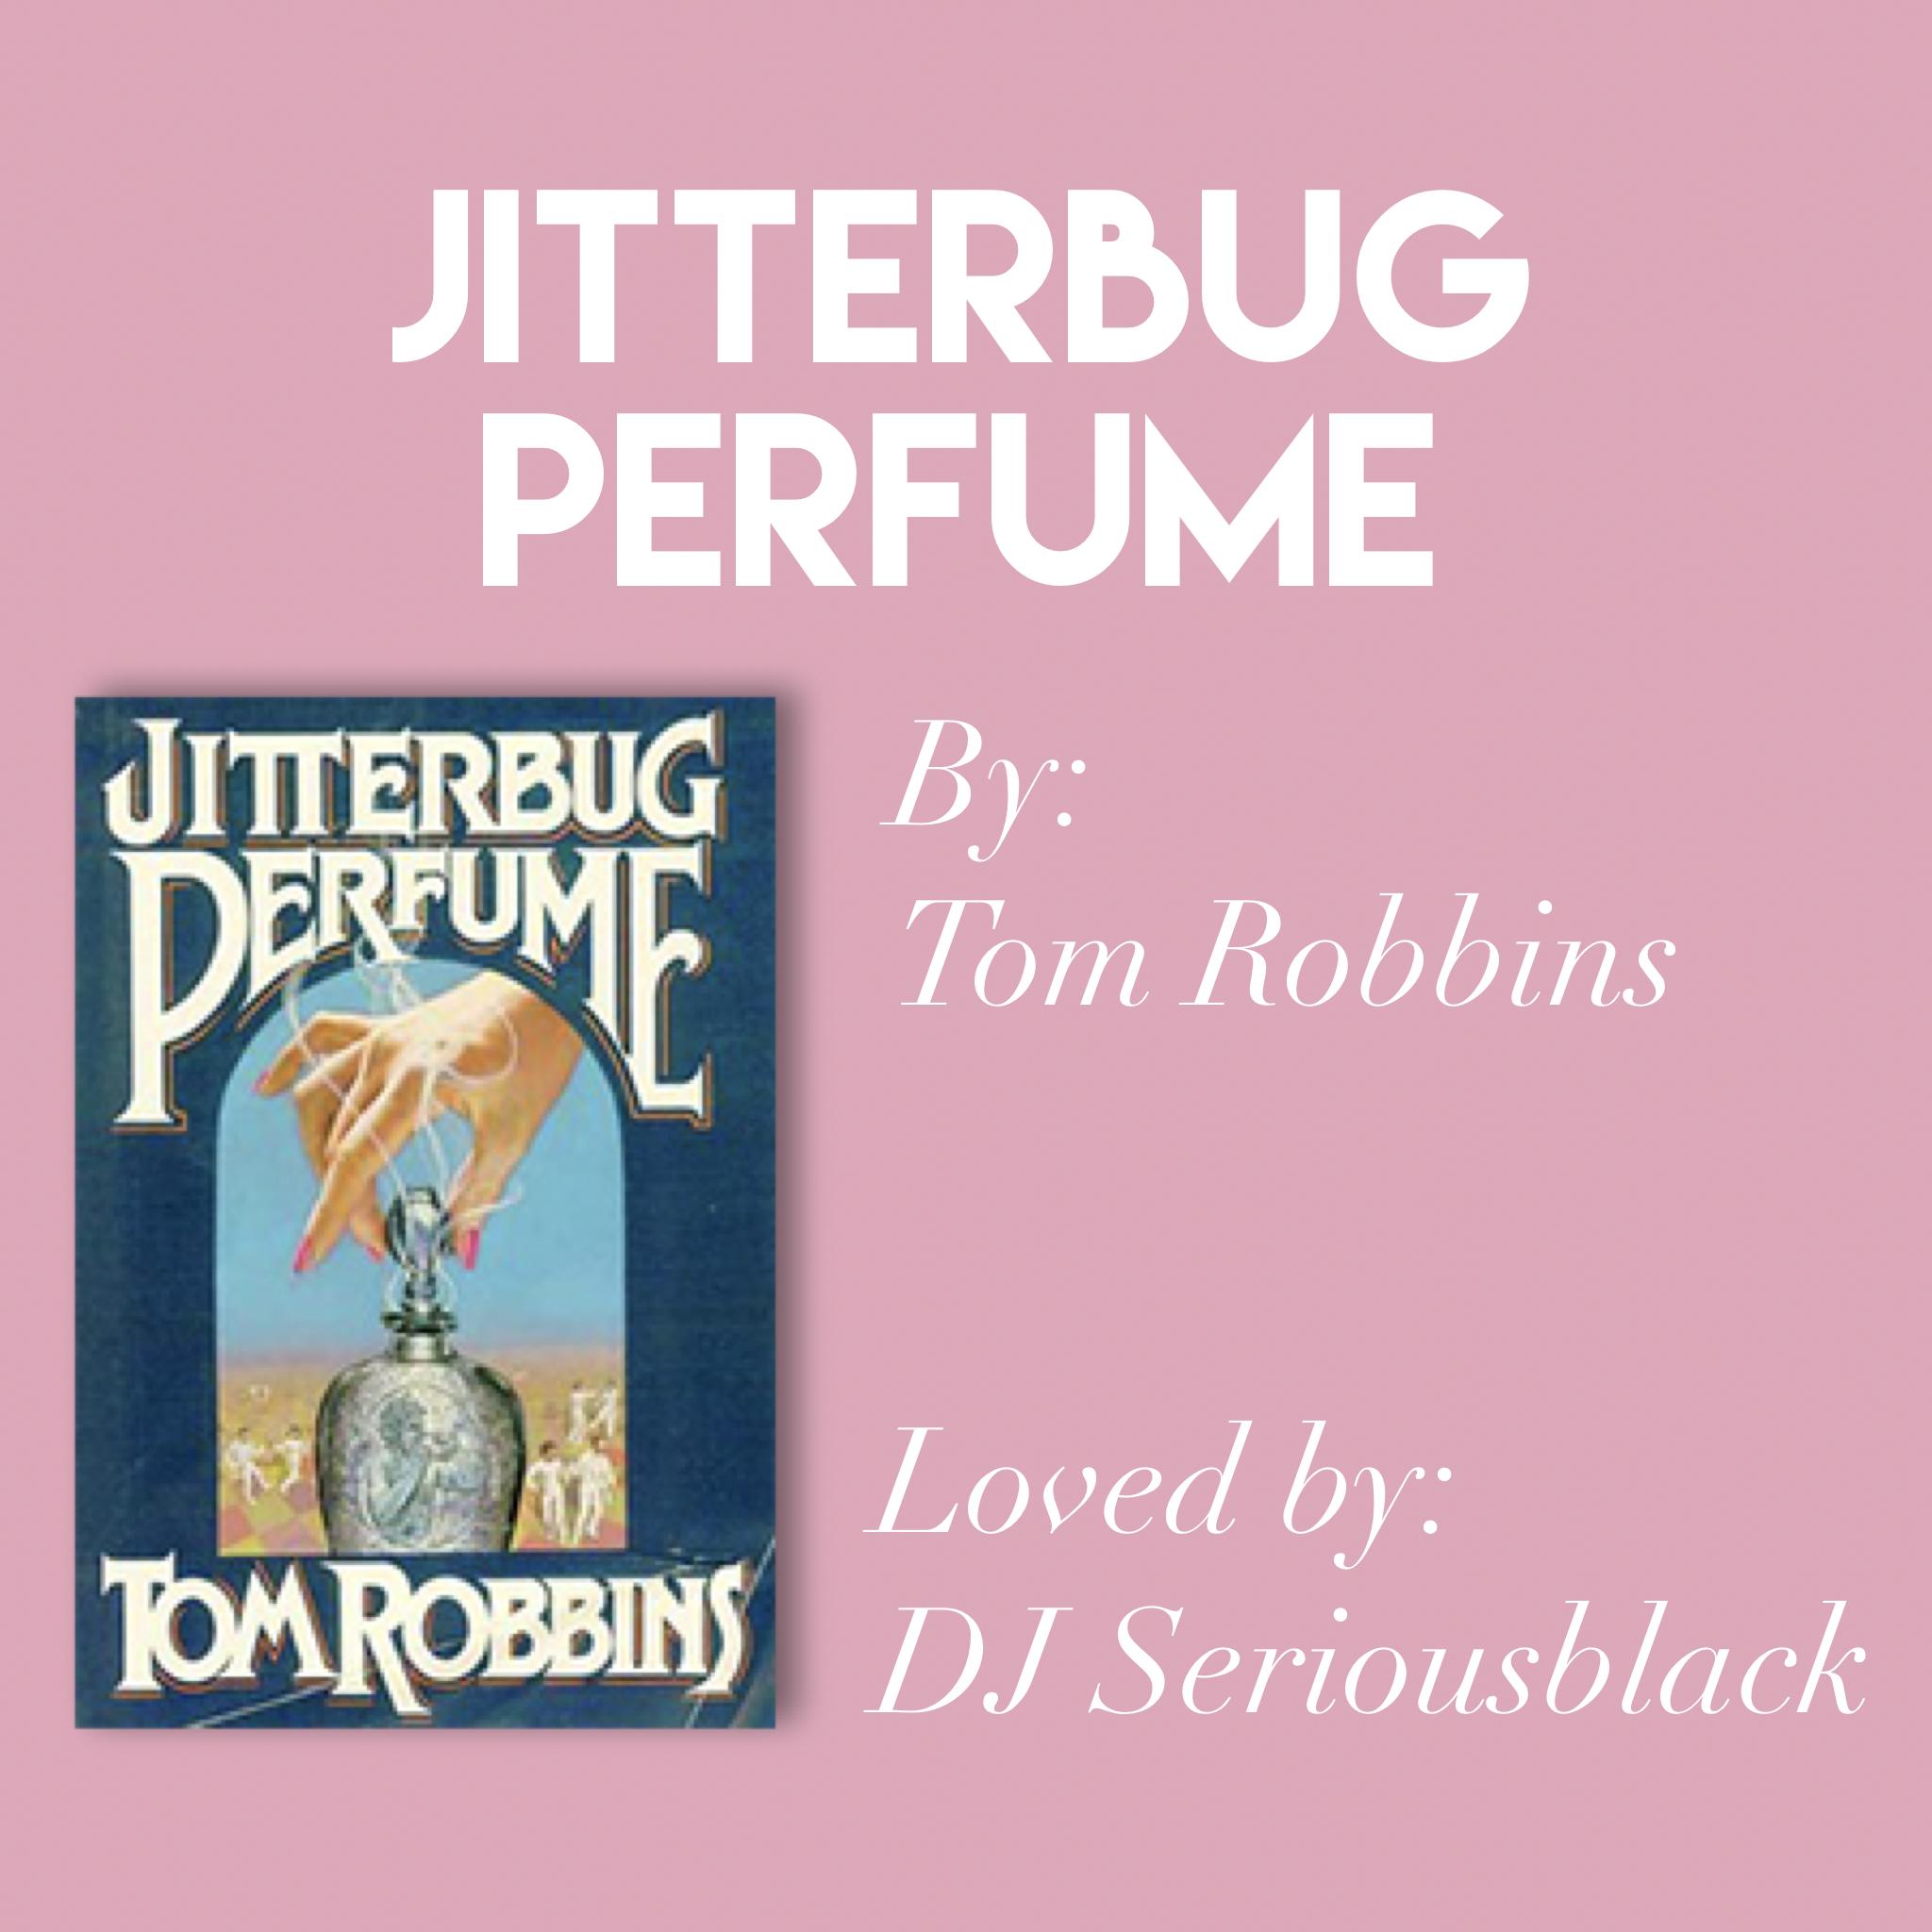 'Jitterbug Perfume' by Tom Robbins // Loved by DJ Seriousblack